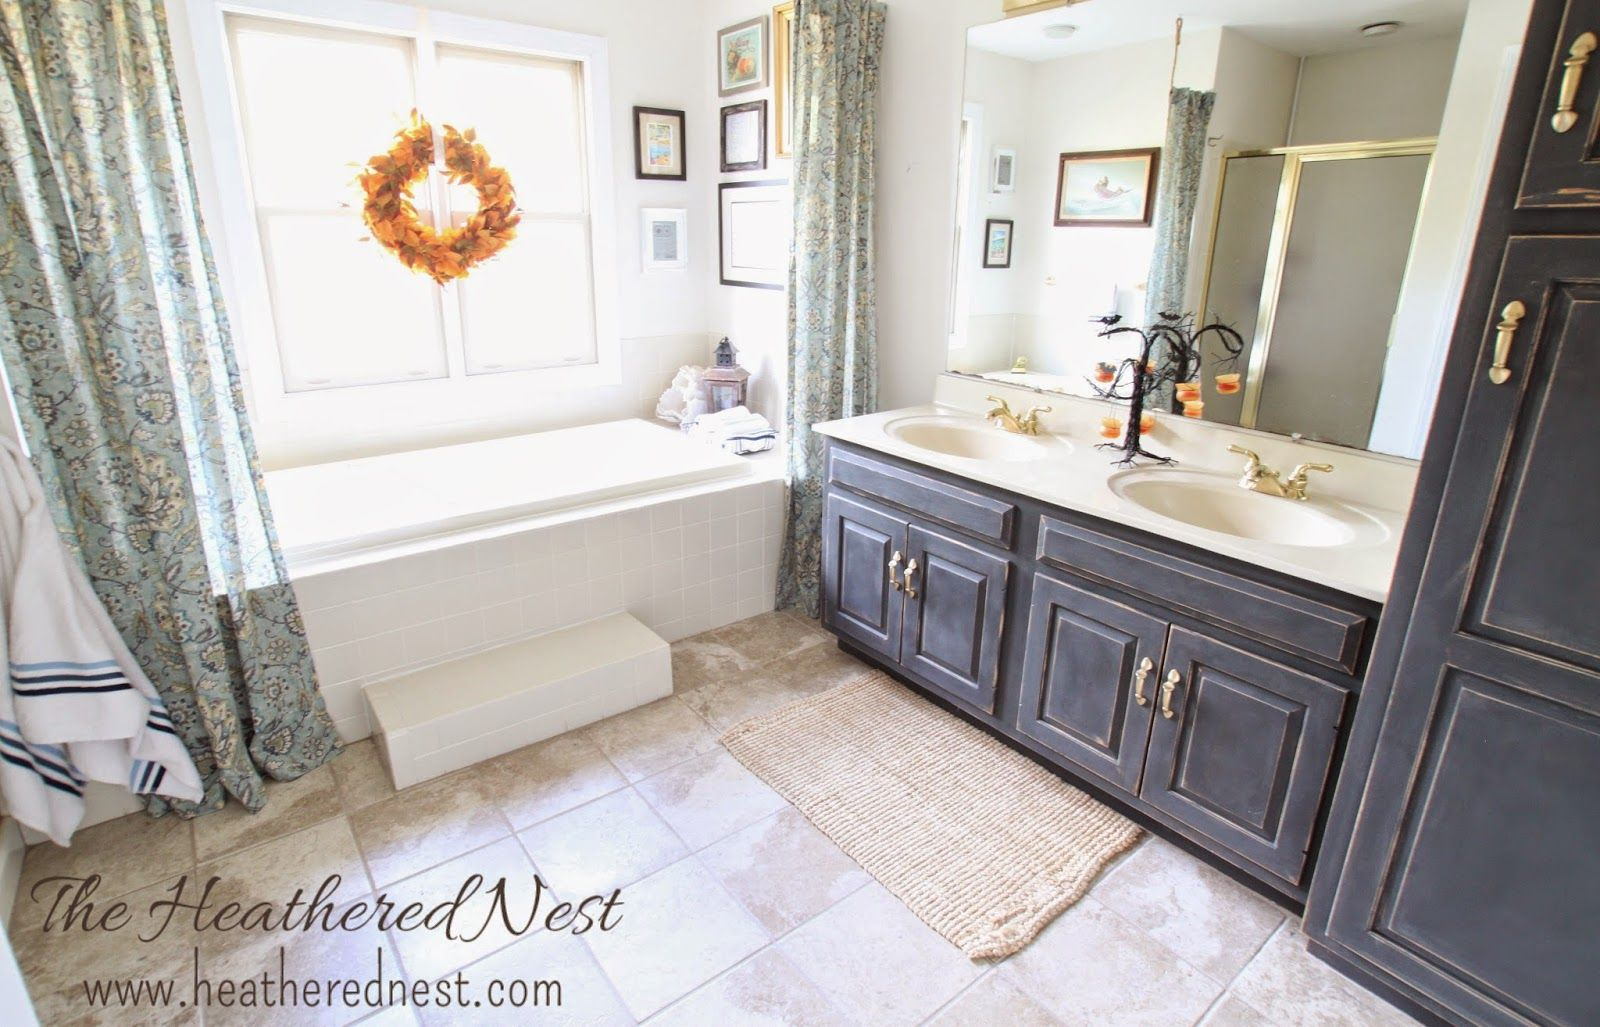 Heathered Nest Master Bath Makeover - for $0